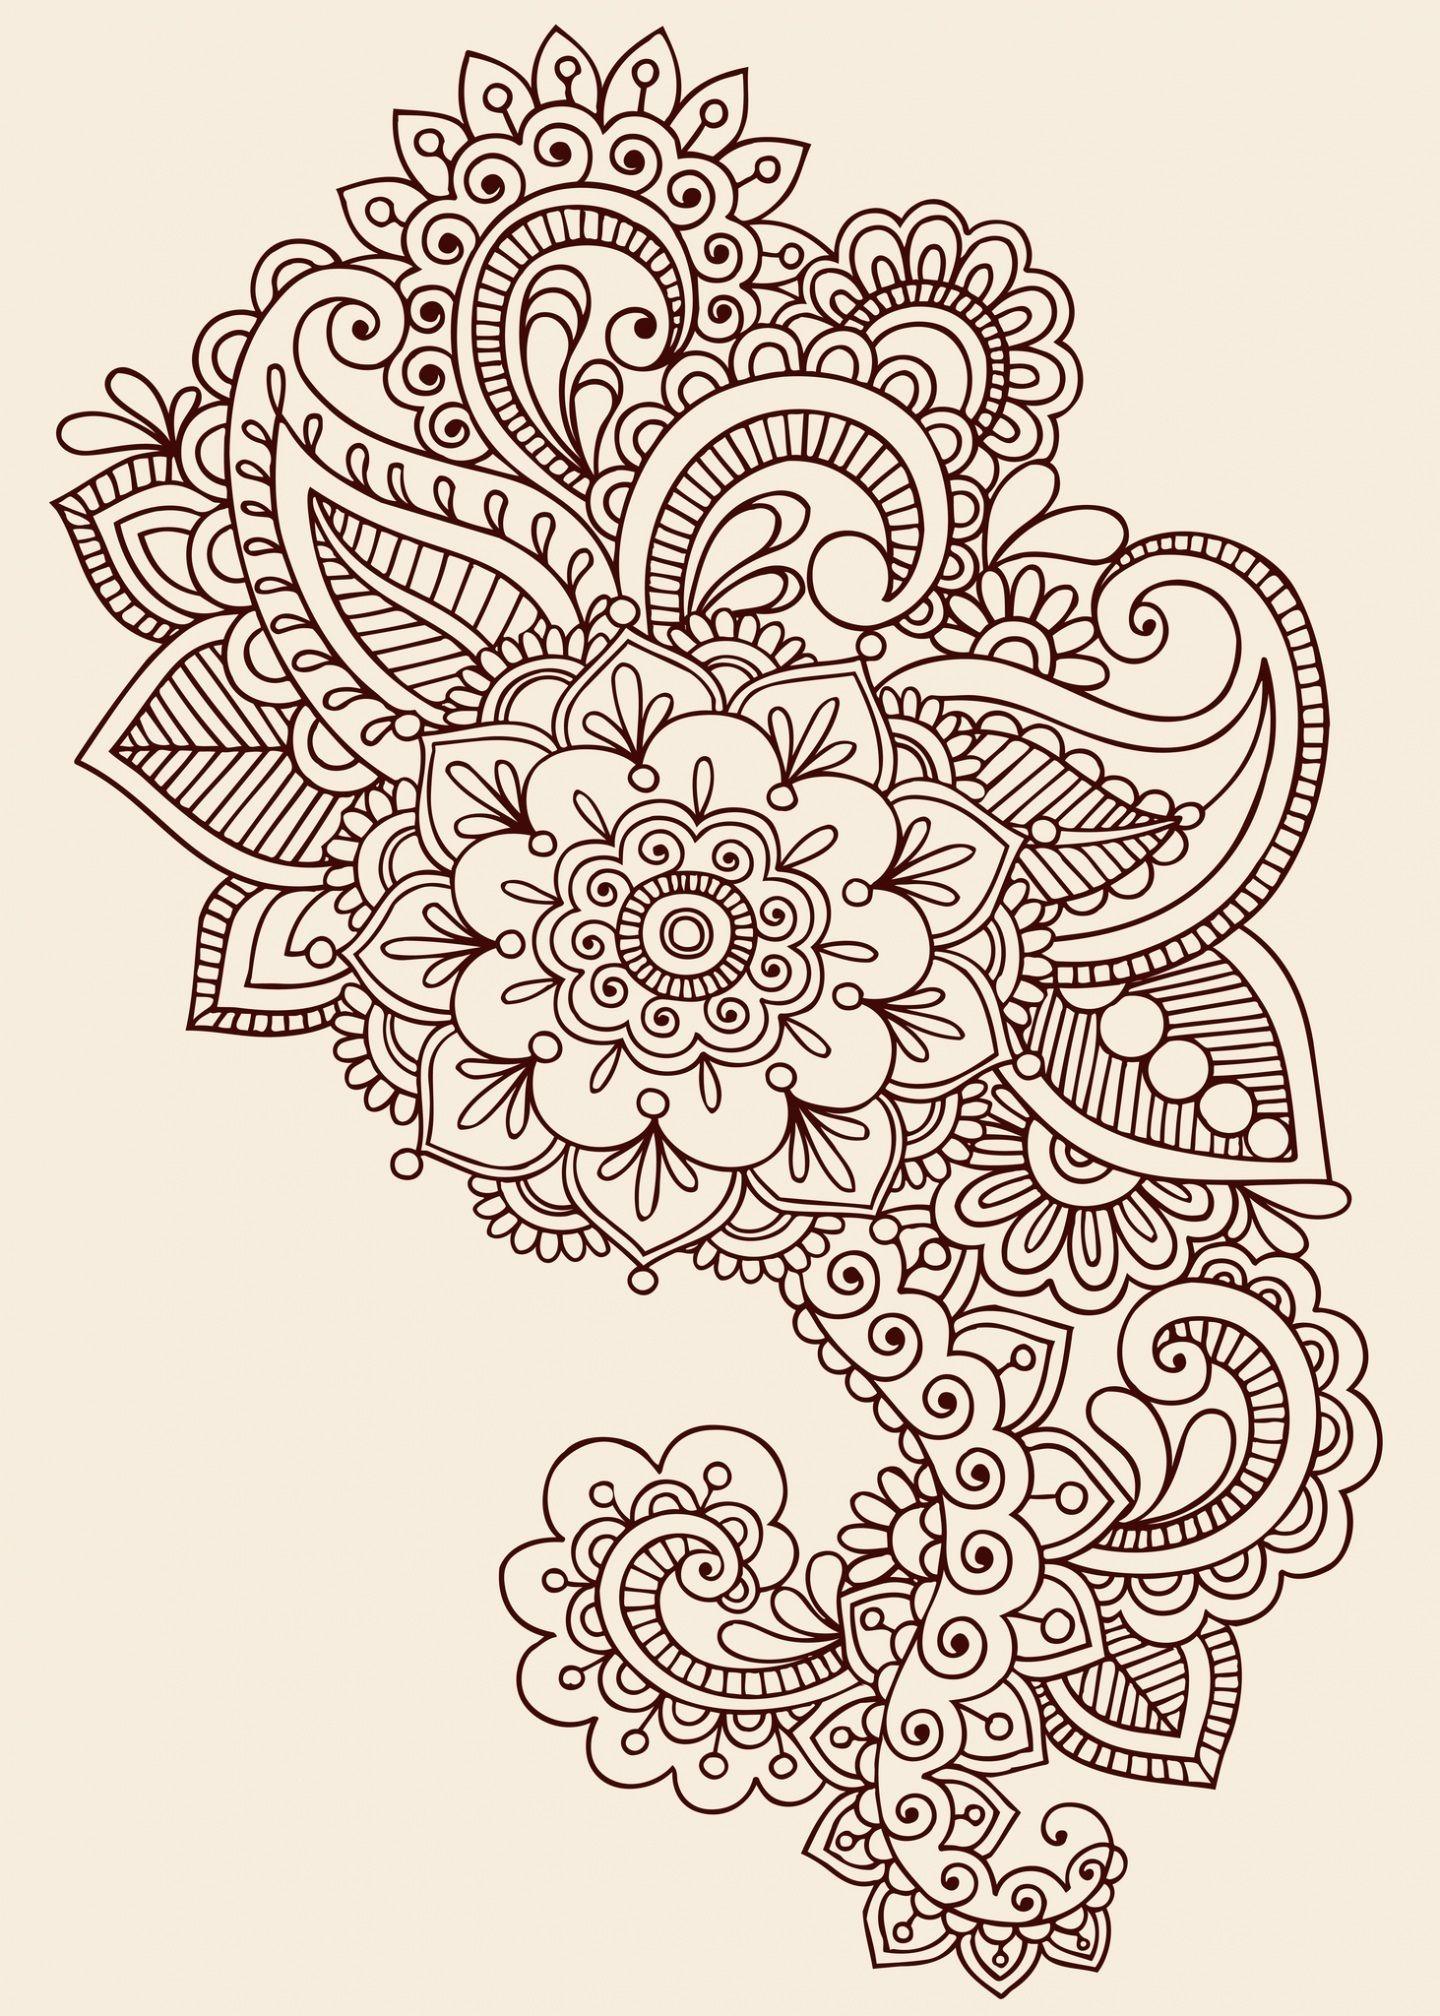 Mandala Henna Designs: Paisley Henna Tattoo Design Henna Flower Tattoo Designs